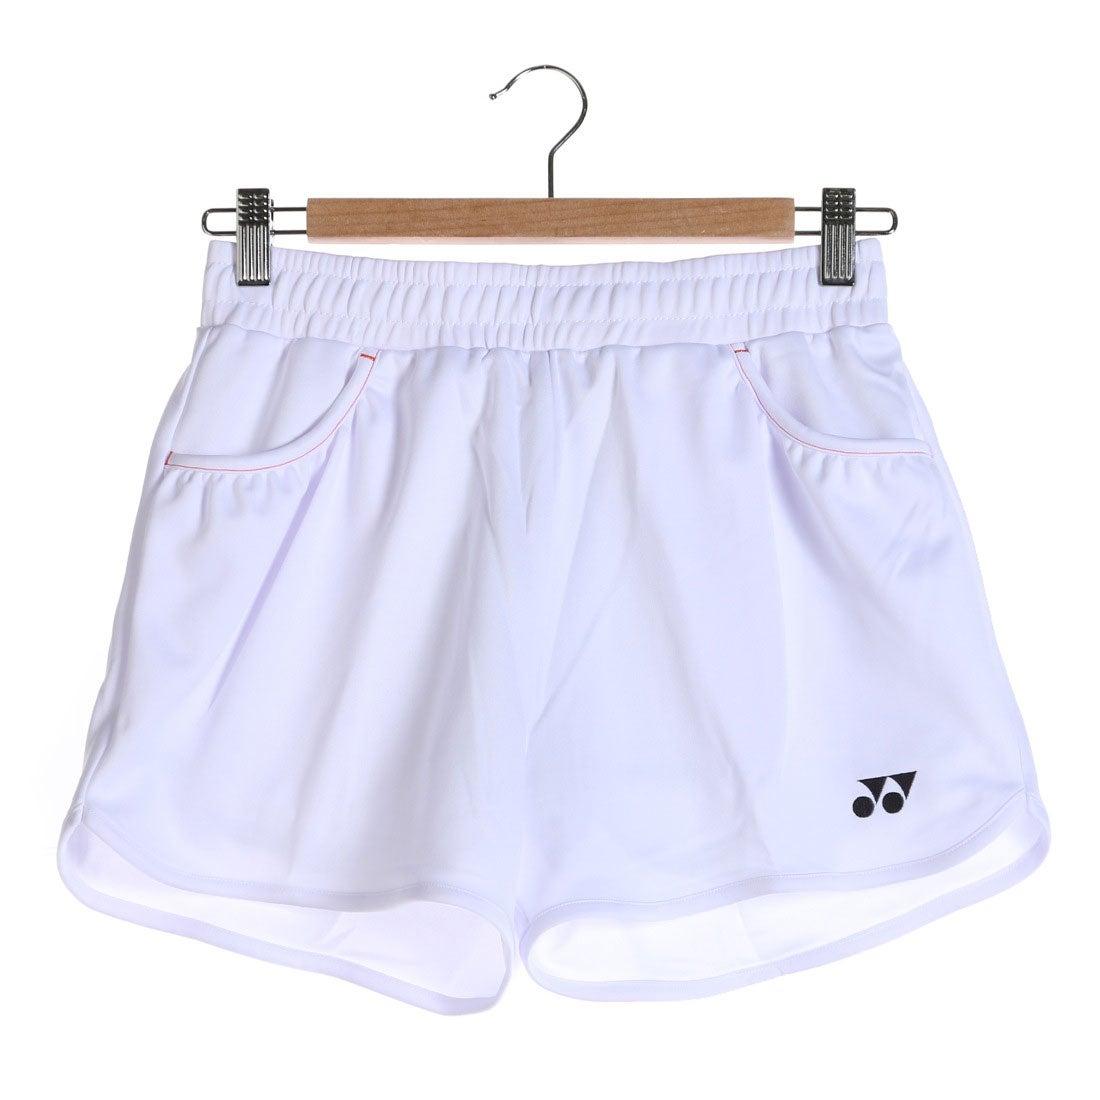 b785e911814f68 ヨネックス YONEX レディース テニス ハーフパンツ ニットショートパンツ 25019 -レディースファッション通販 ロコンドガールズコレクション  (ロココレ)